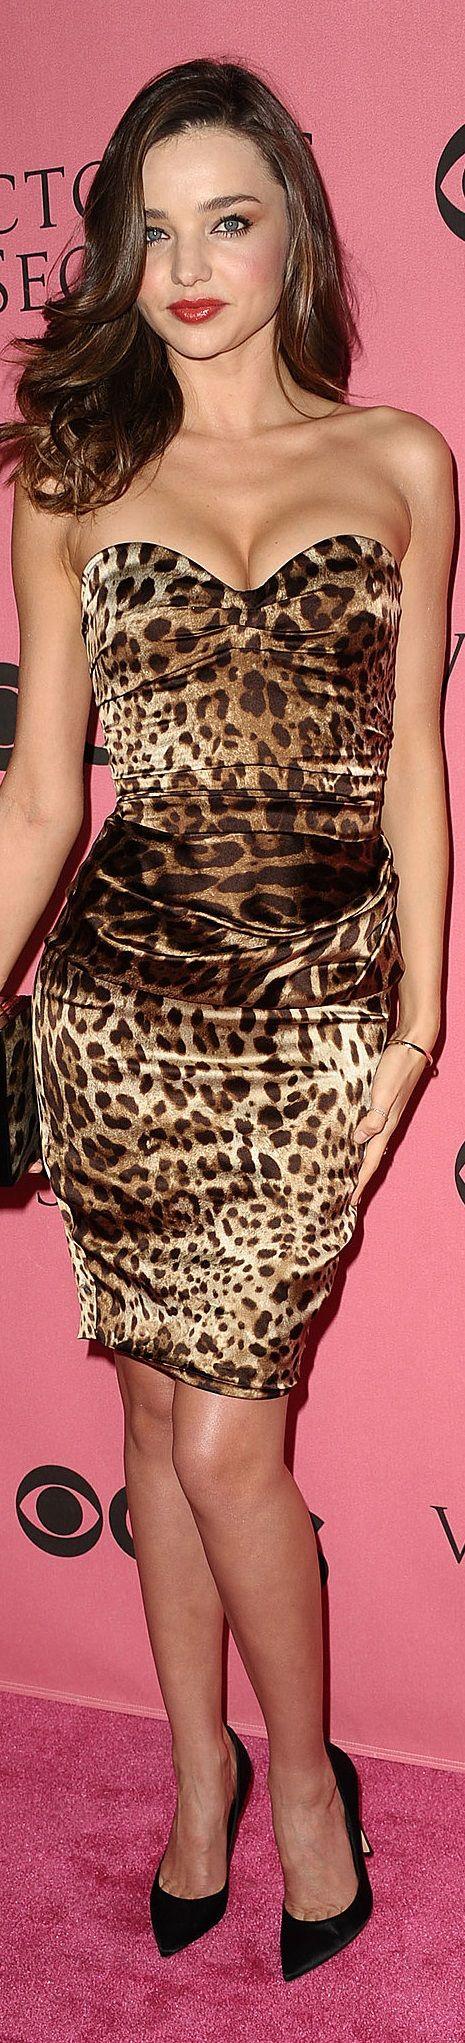 Miranda Kerr in Dolce & Gabbana ♔Style2 #Style2 #MirandaKerr #PierreMcNeilGroup